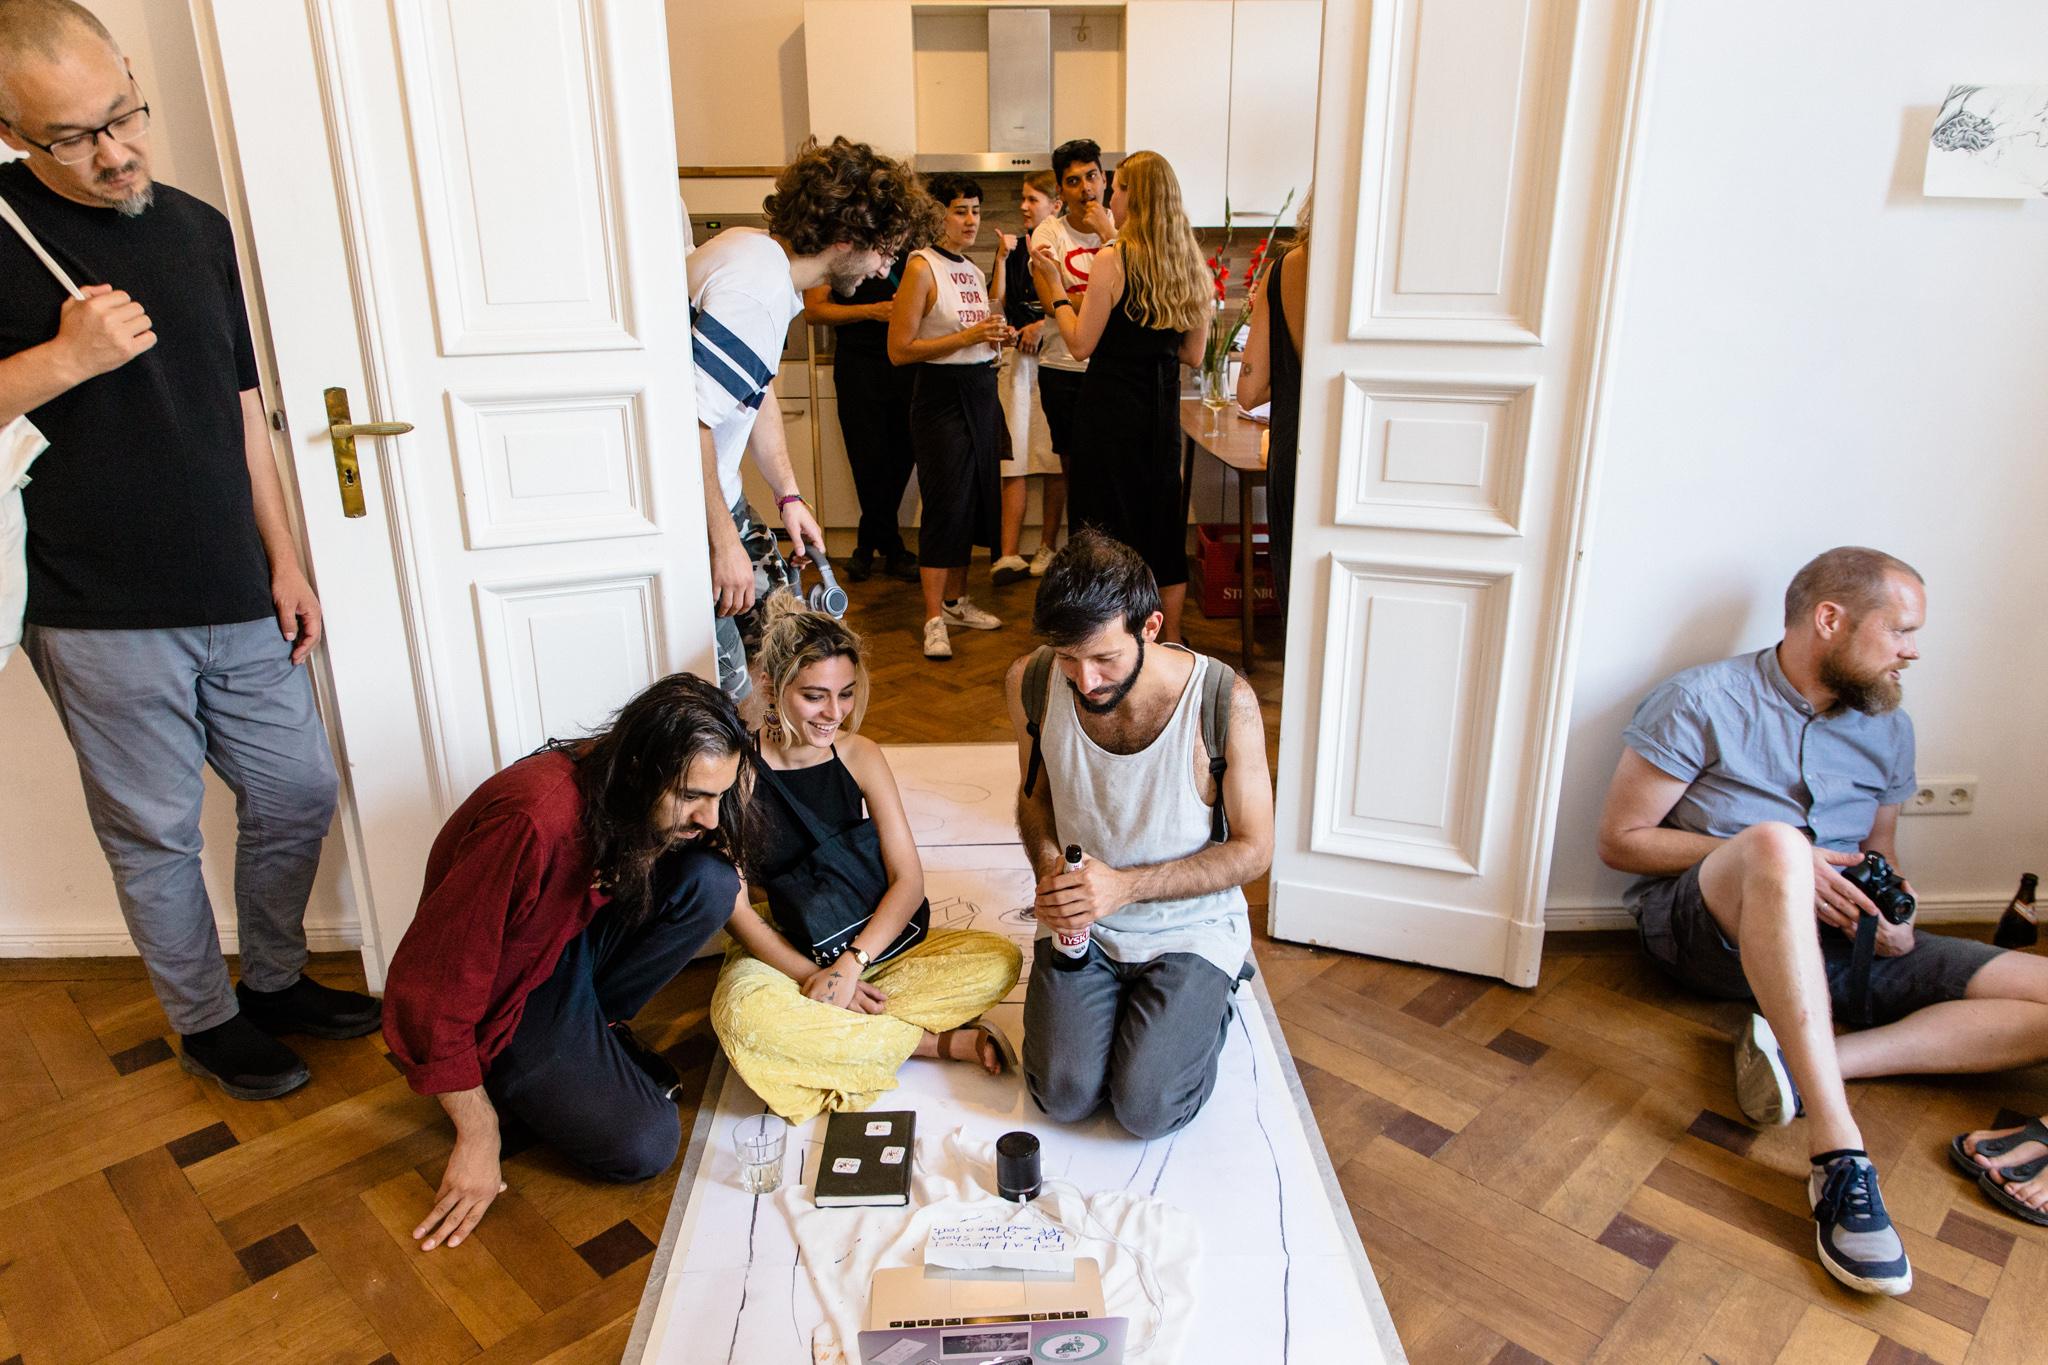 Liminal Space, Yara Said, Video and installation, 2018